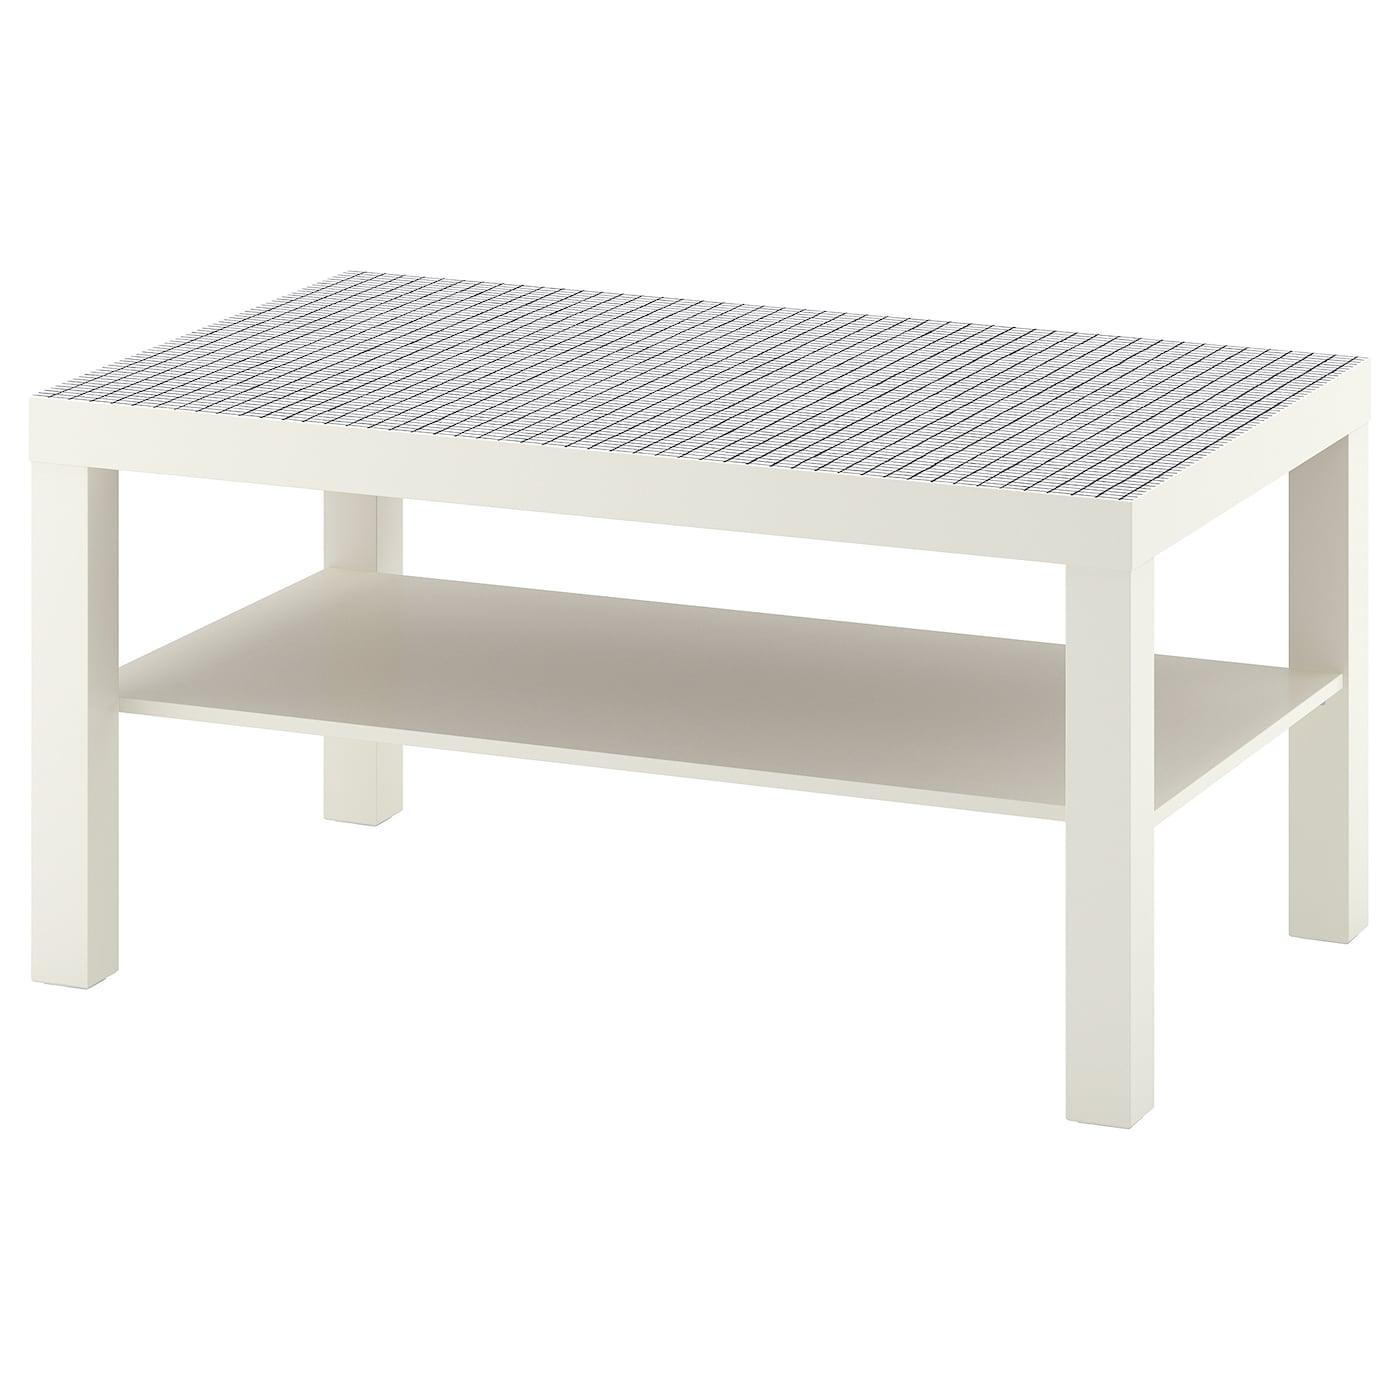 lack table basse blanc motif carreaux 90 x 55 cm ikea. Black Bedroom Furniture Sets. Home Design Ideas